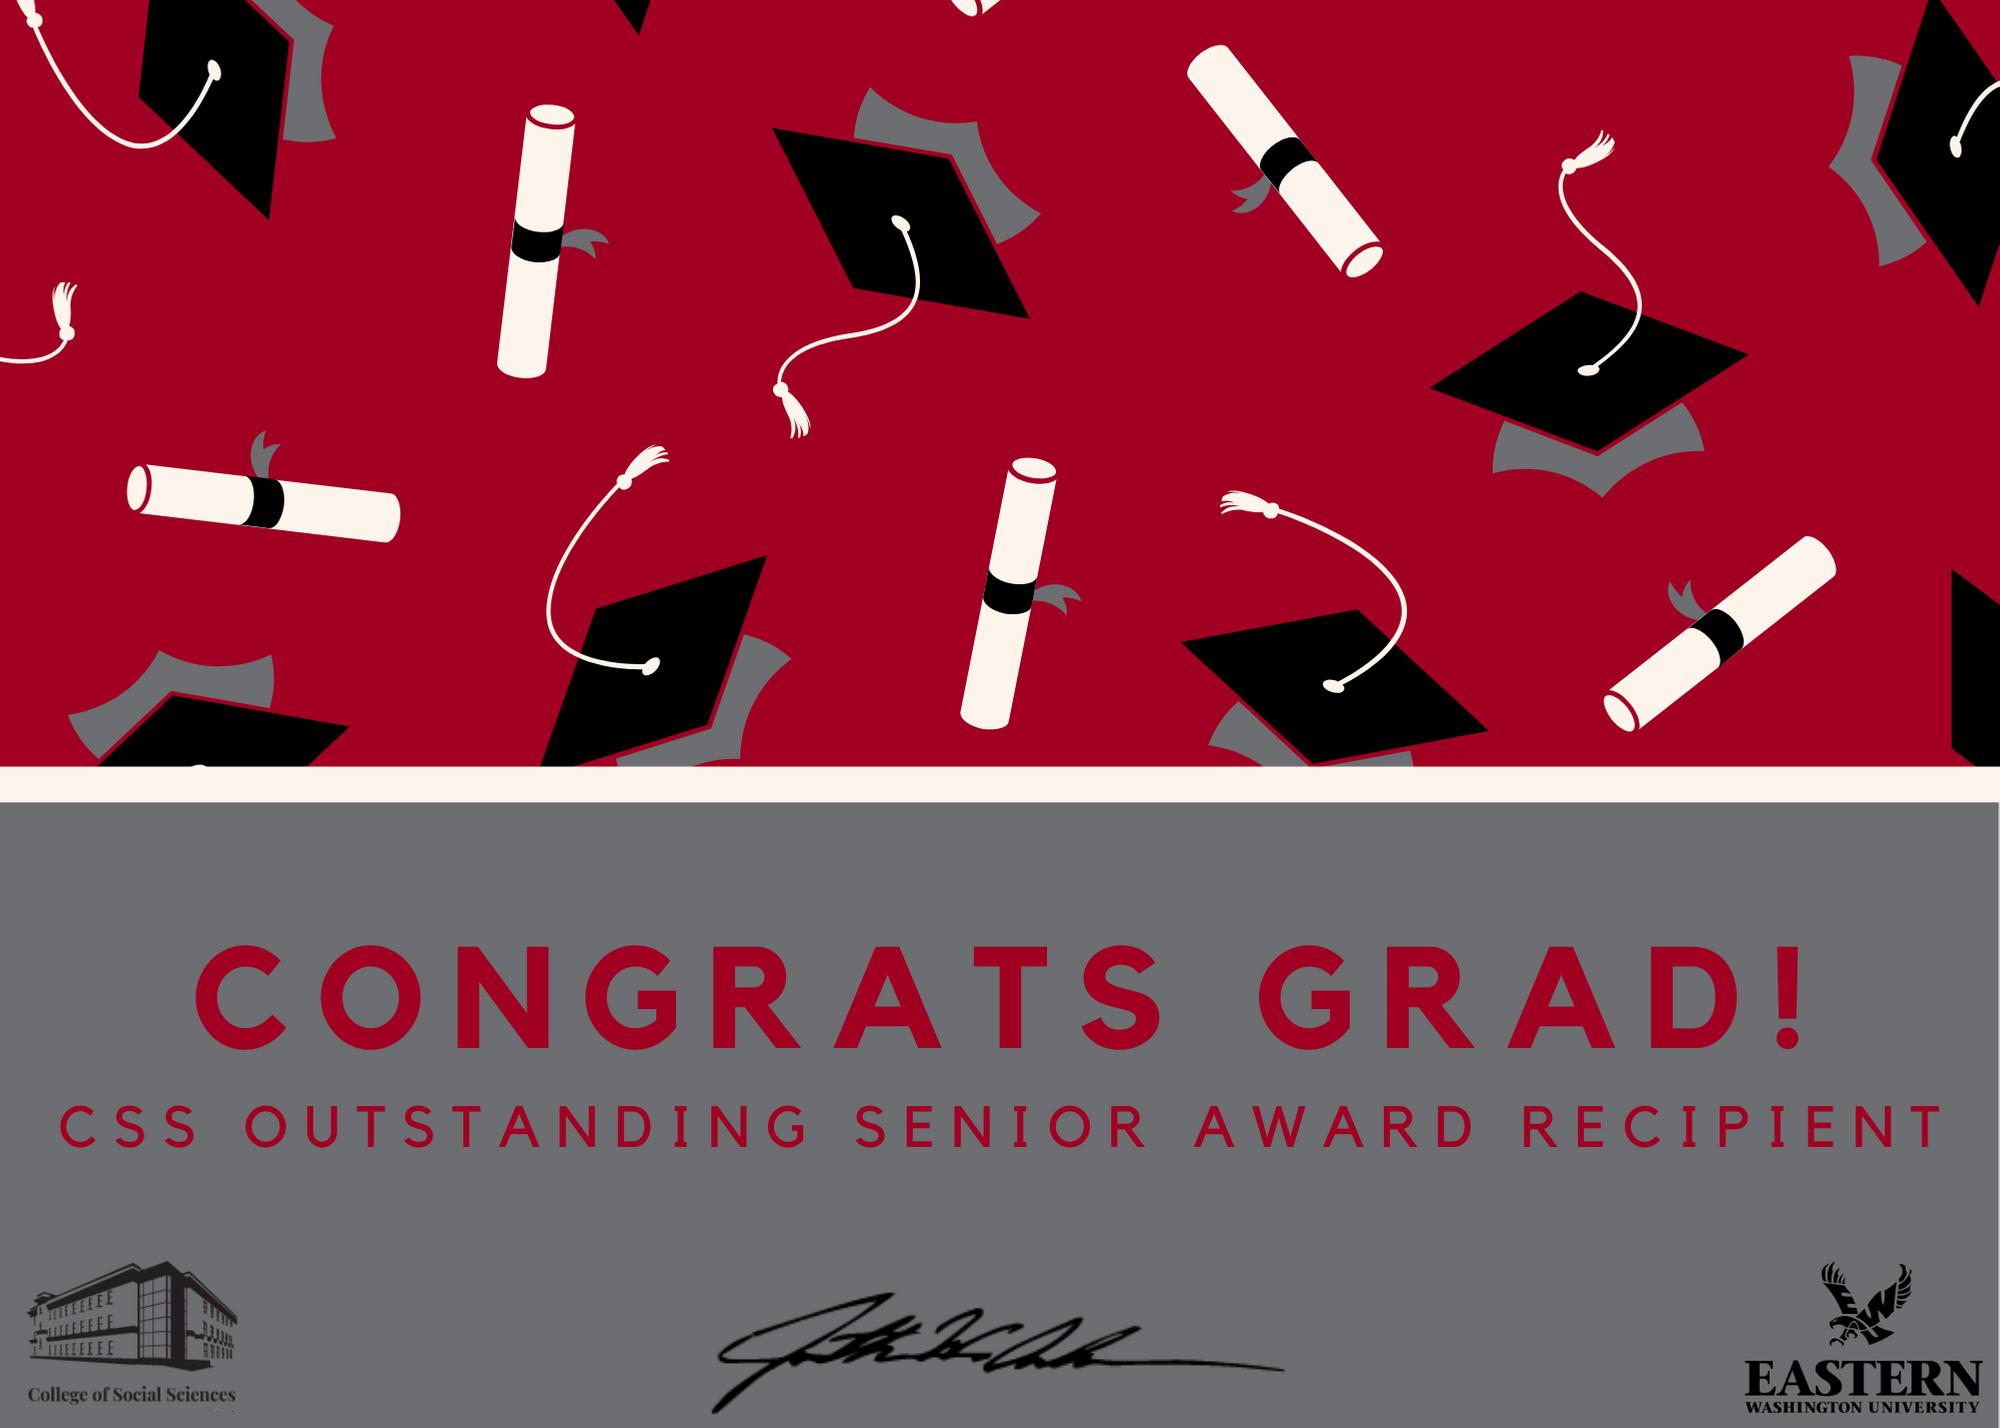 4102-caps-and-diplomas-pattern-graduation-card-2.png